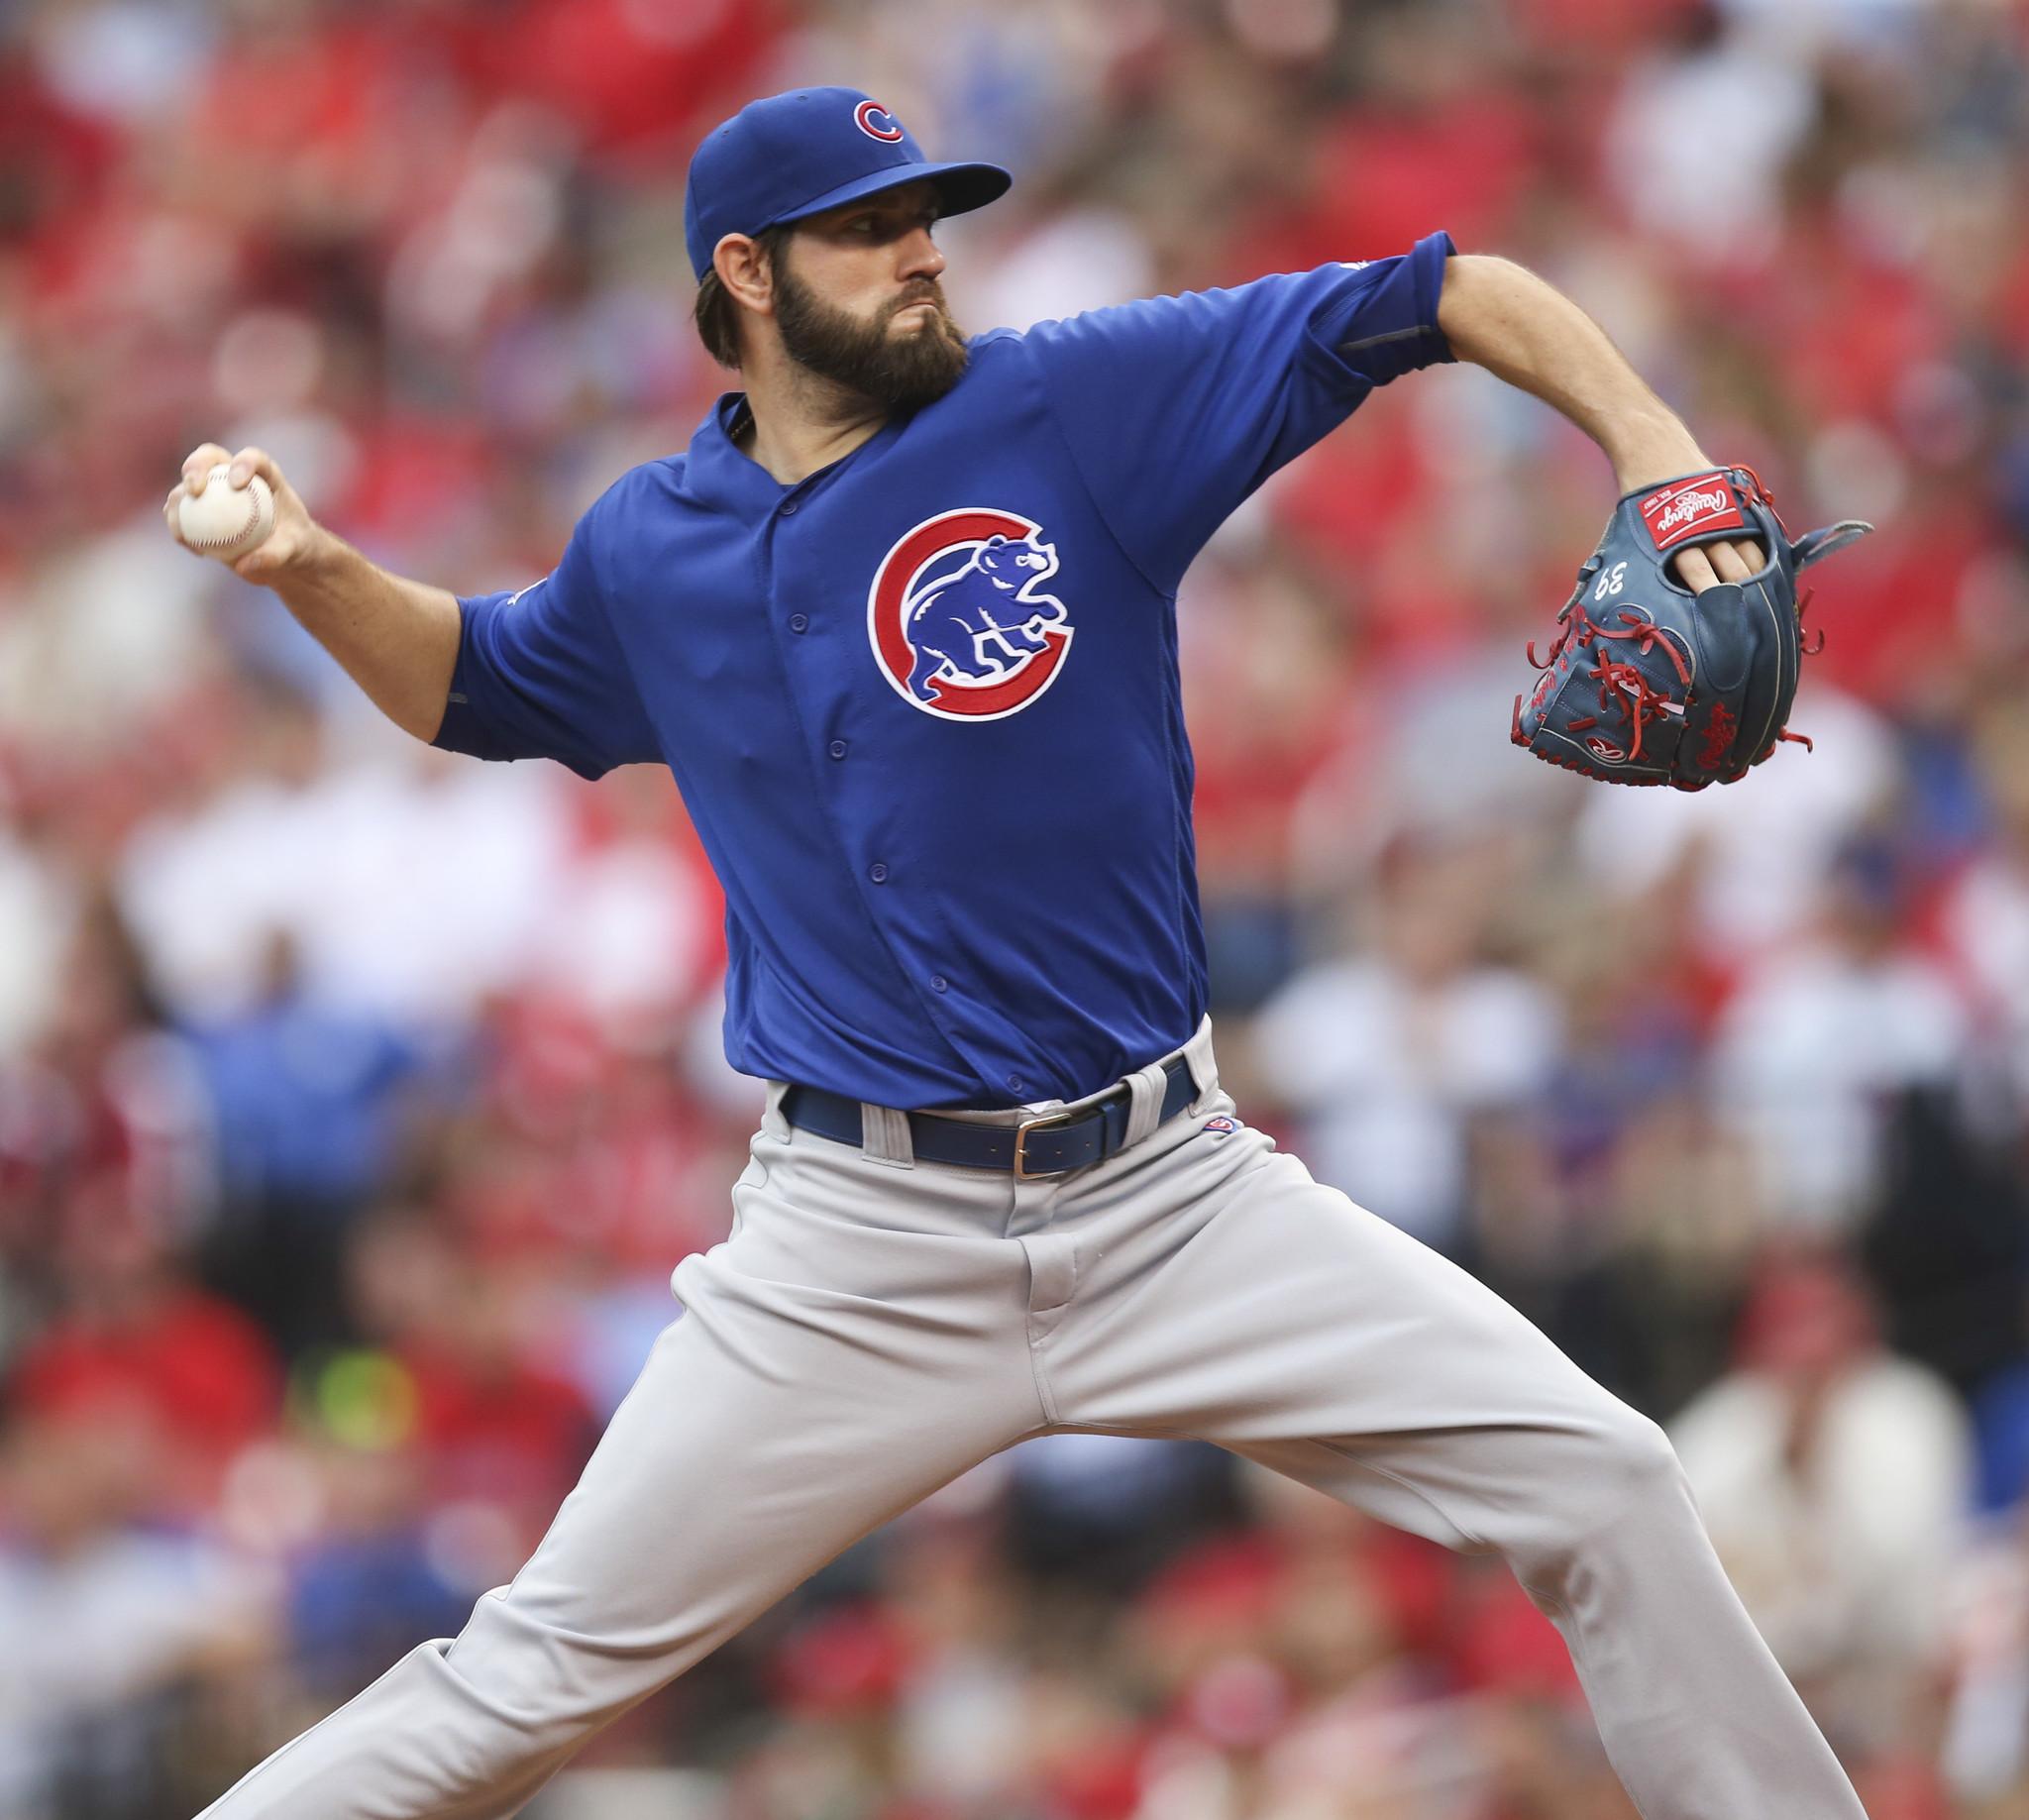 Ct-cubs-jason-hammel-pitching-support-20160524